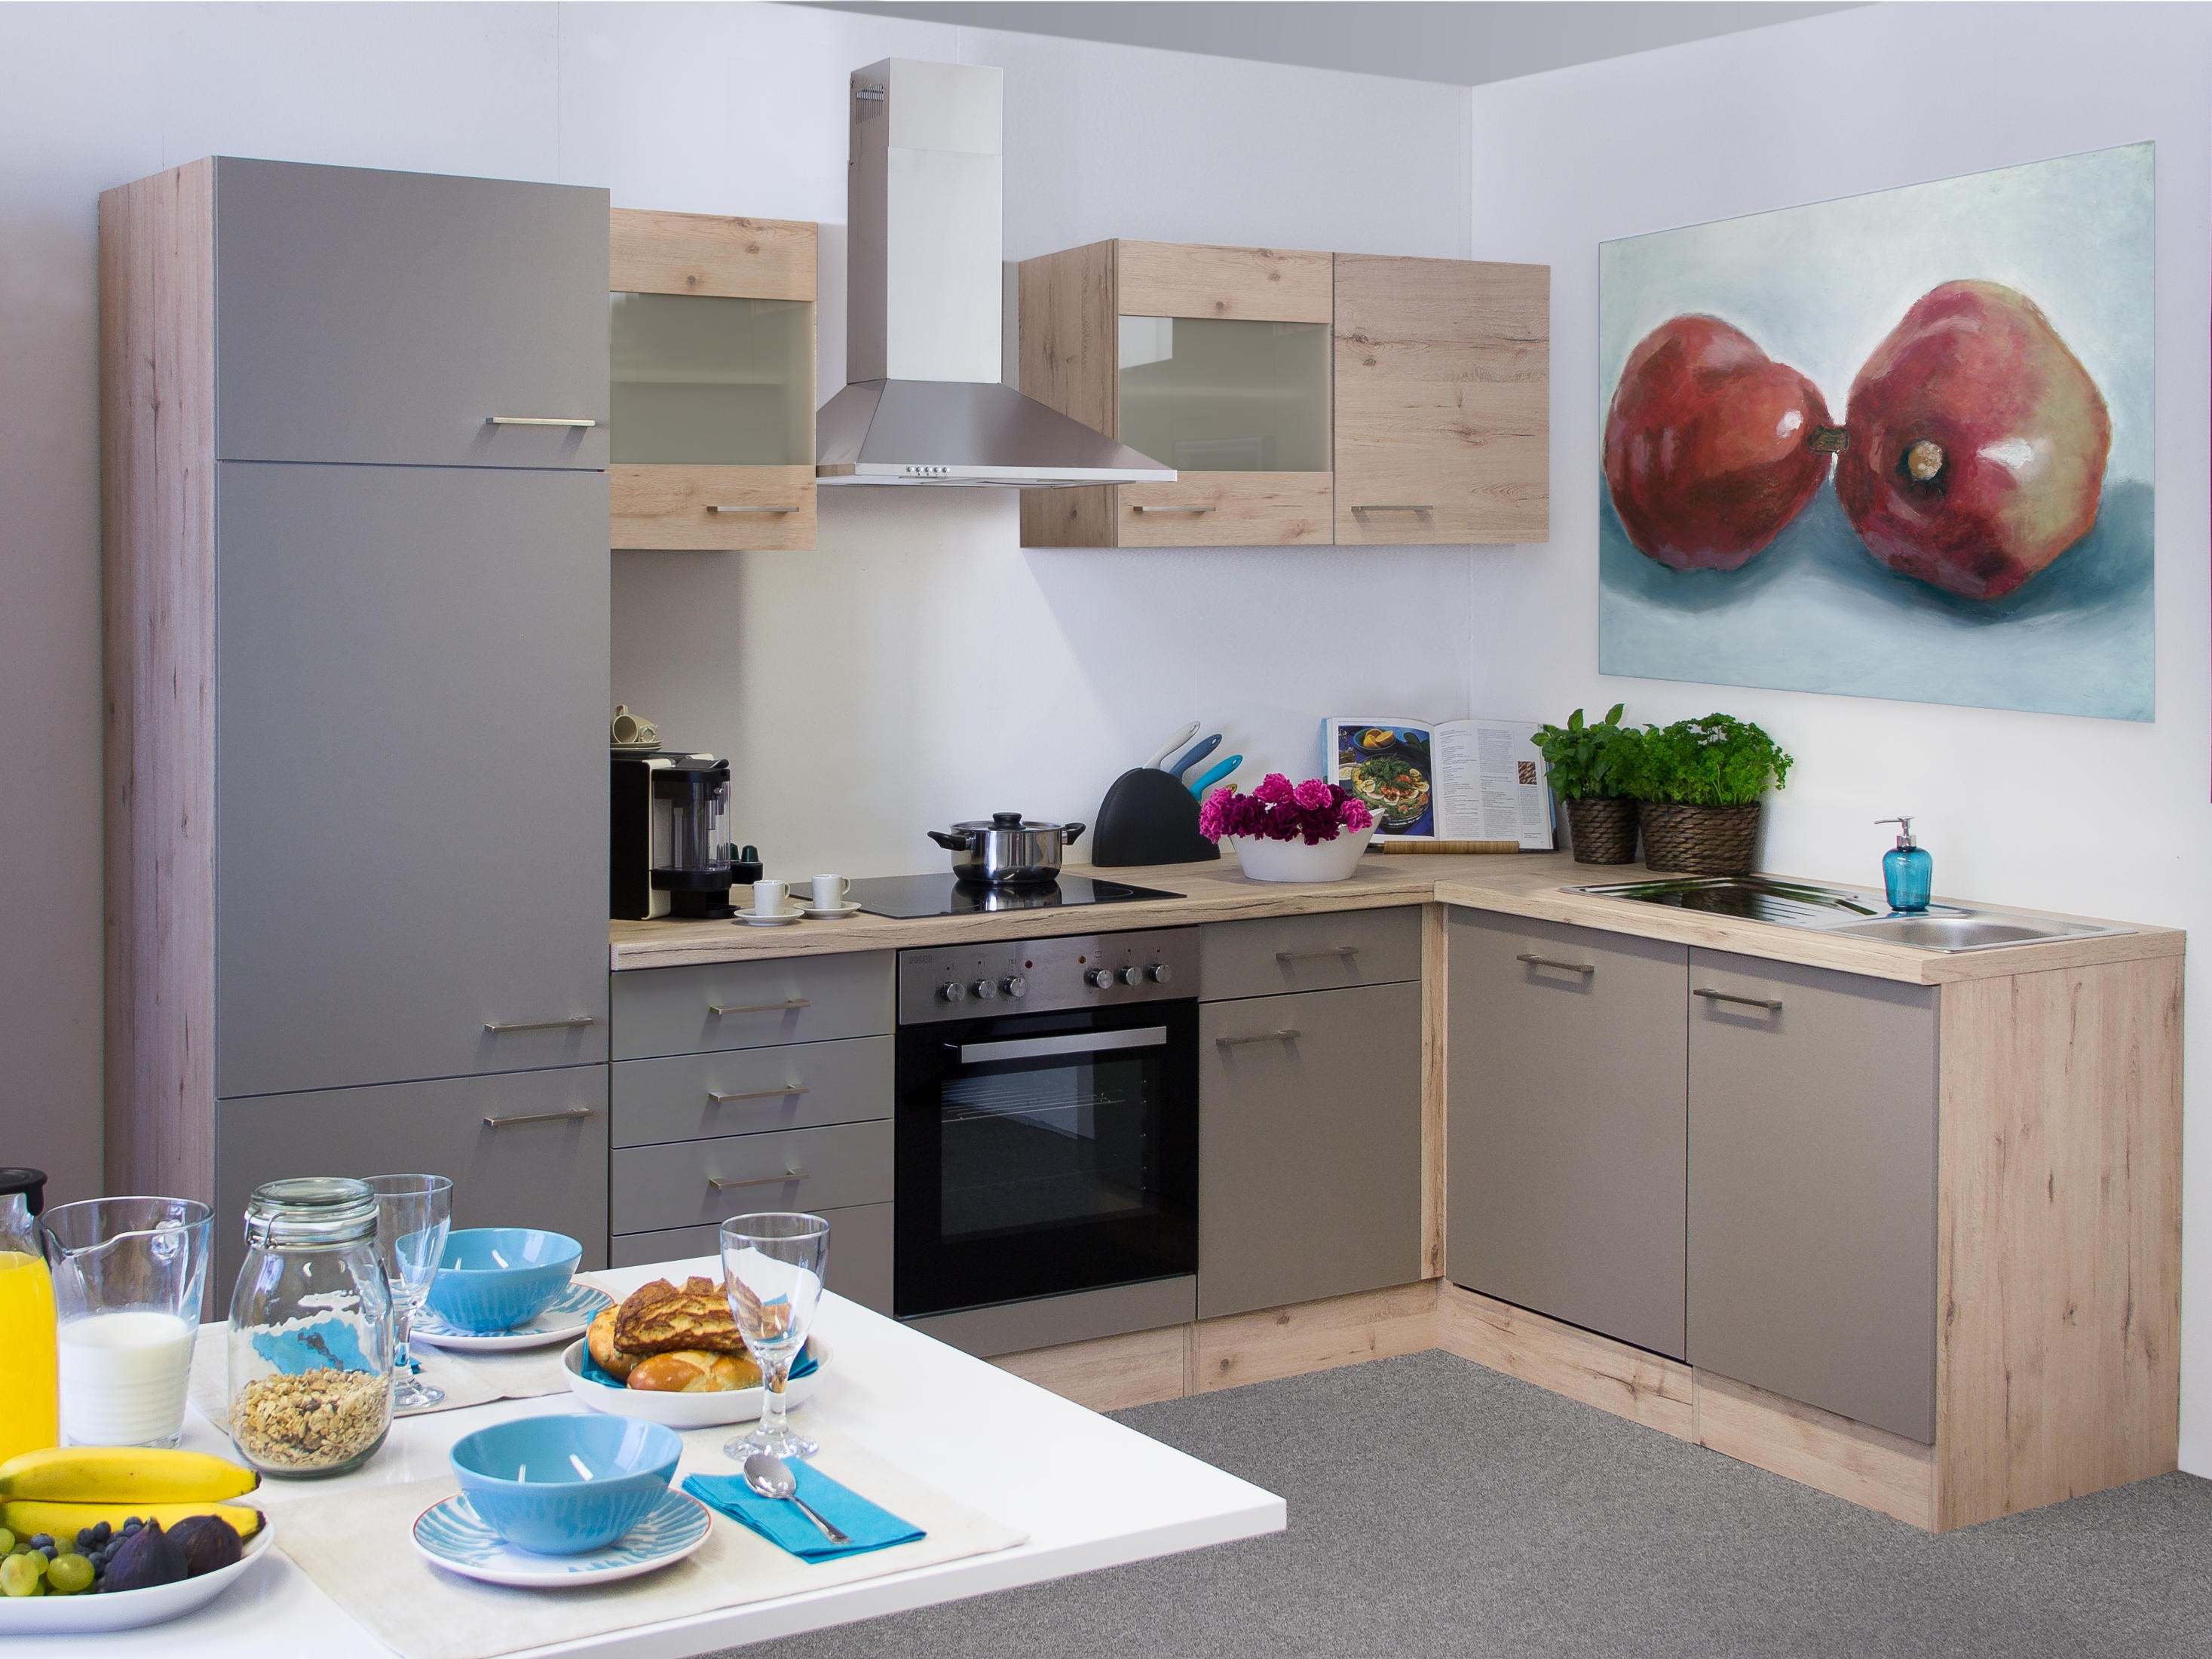 Eckkuche mit elektrogeraten kreative ideen fur design for Eckküche mit elektroger ten